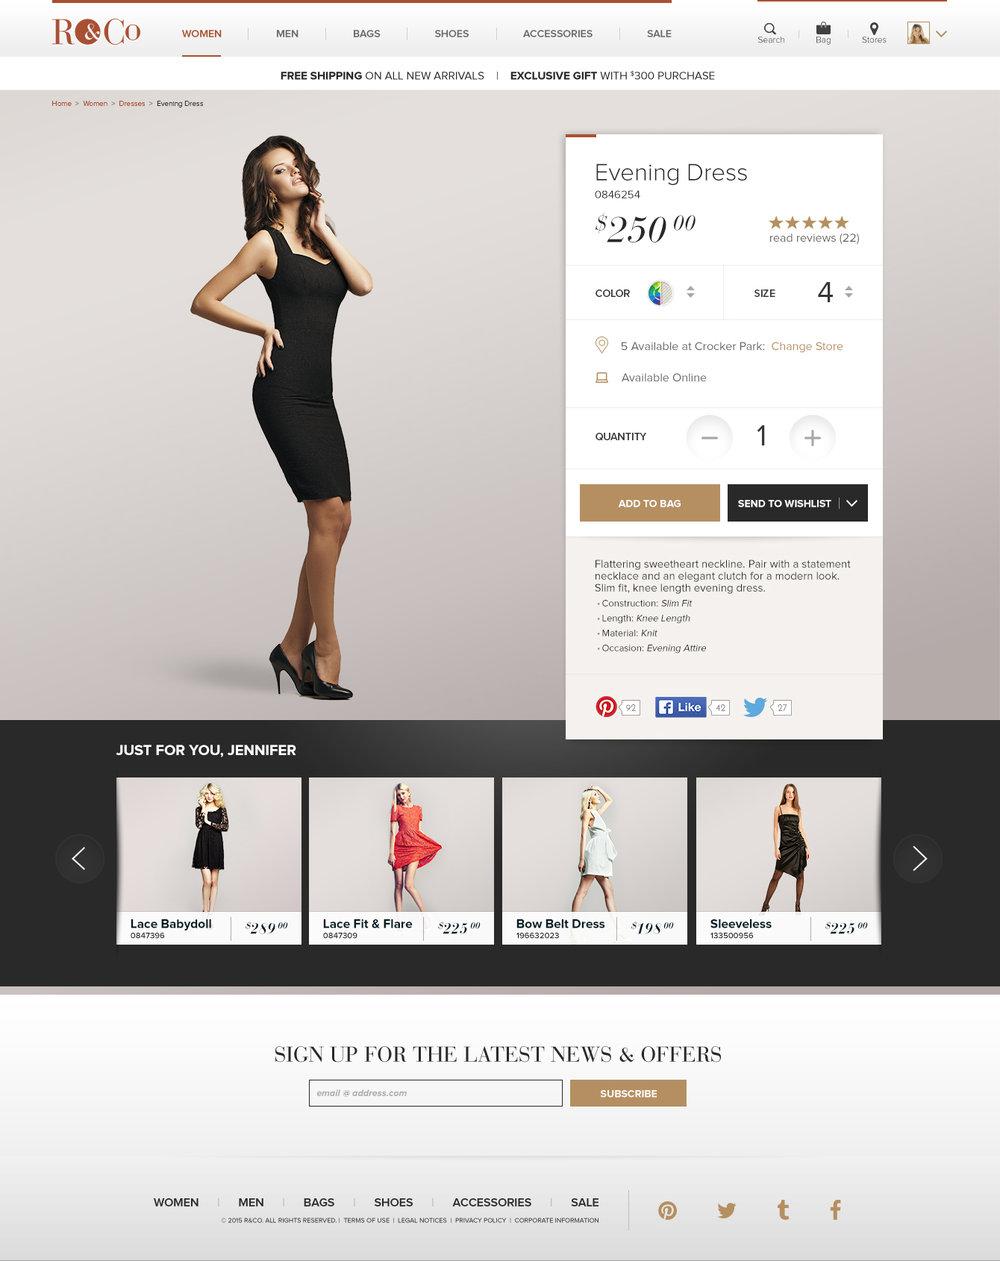 RCO_SG_04.0_0002_Dress 3.jpg